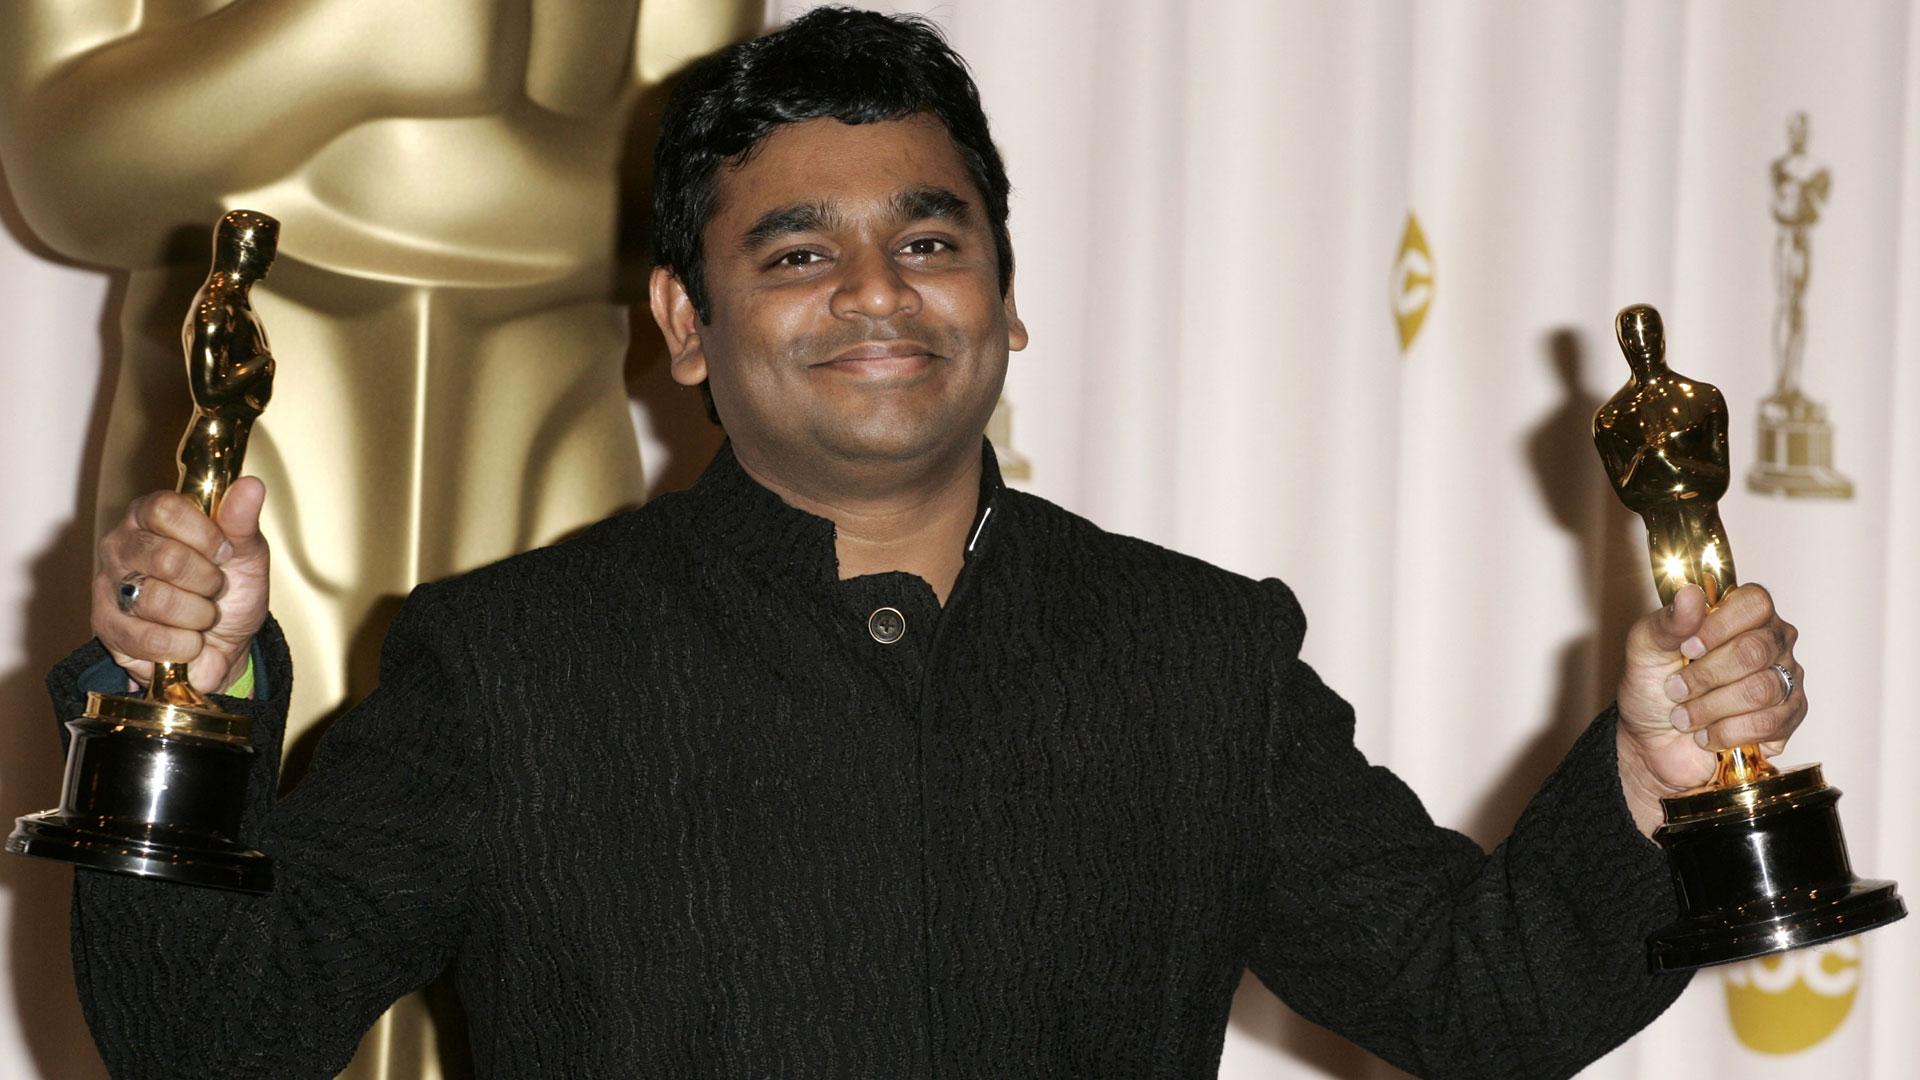 A R Rahman after Oscar win for Slumdog Millionaire